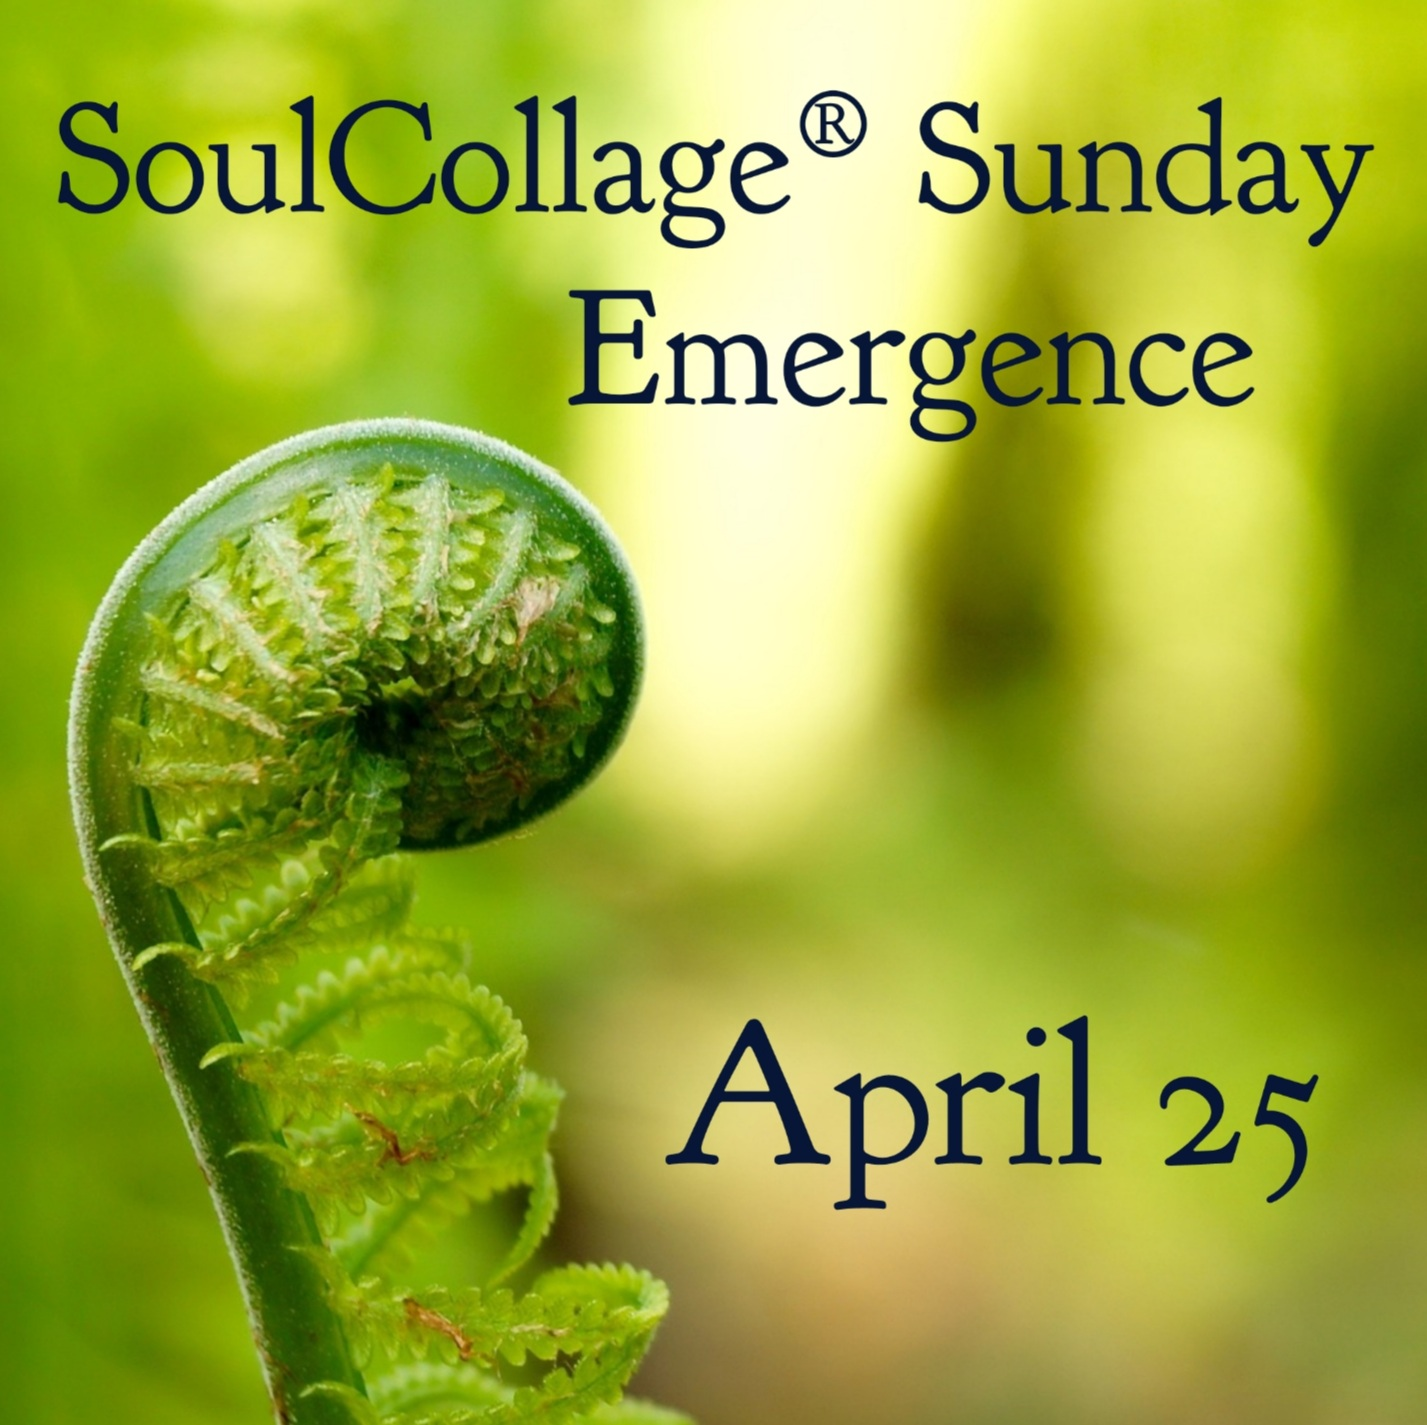 SoulCollage Image by Susanne Jutzeler via Pixabay